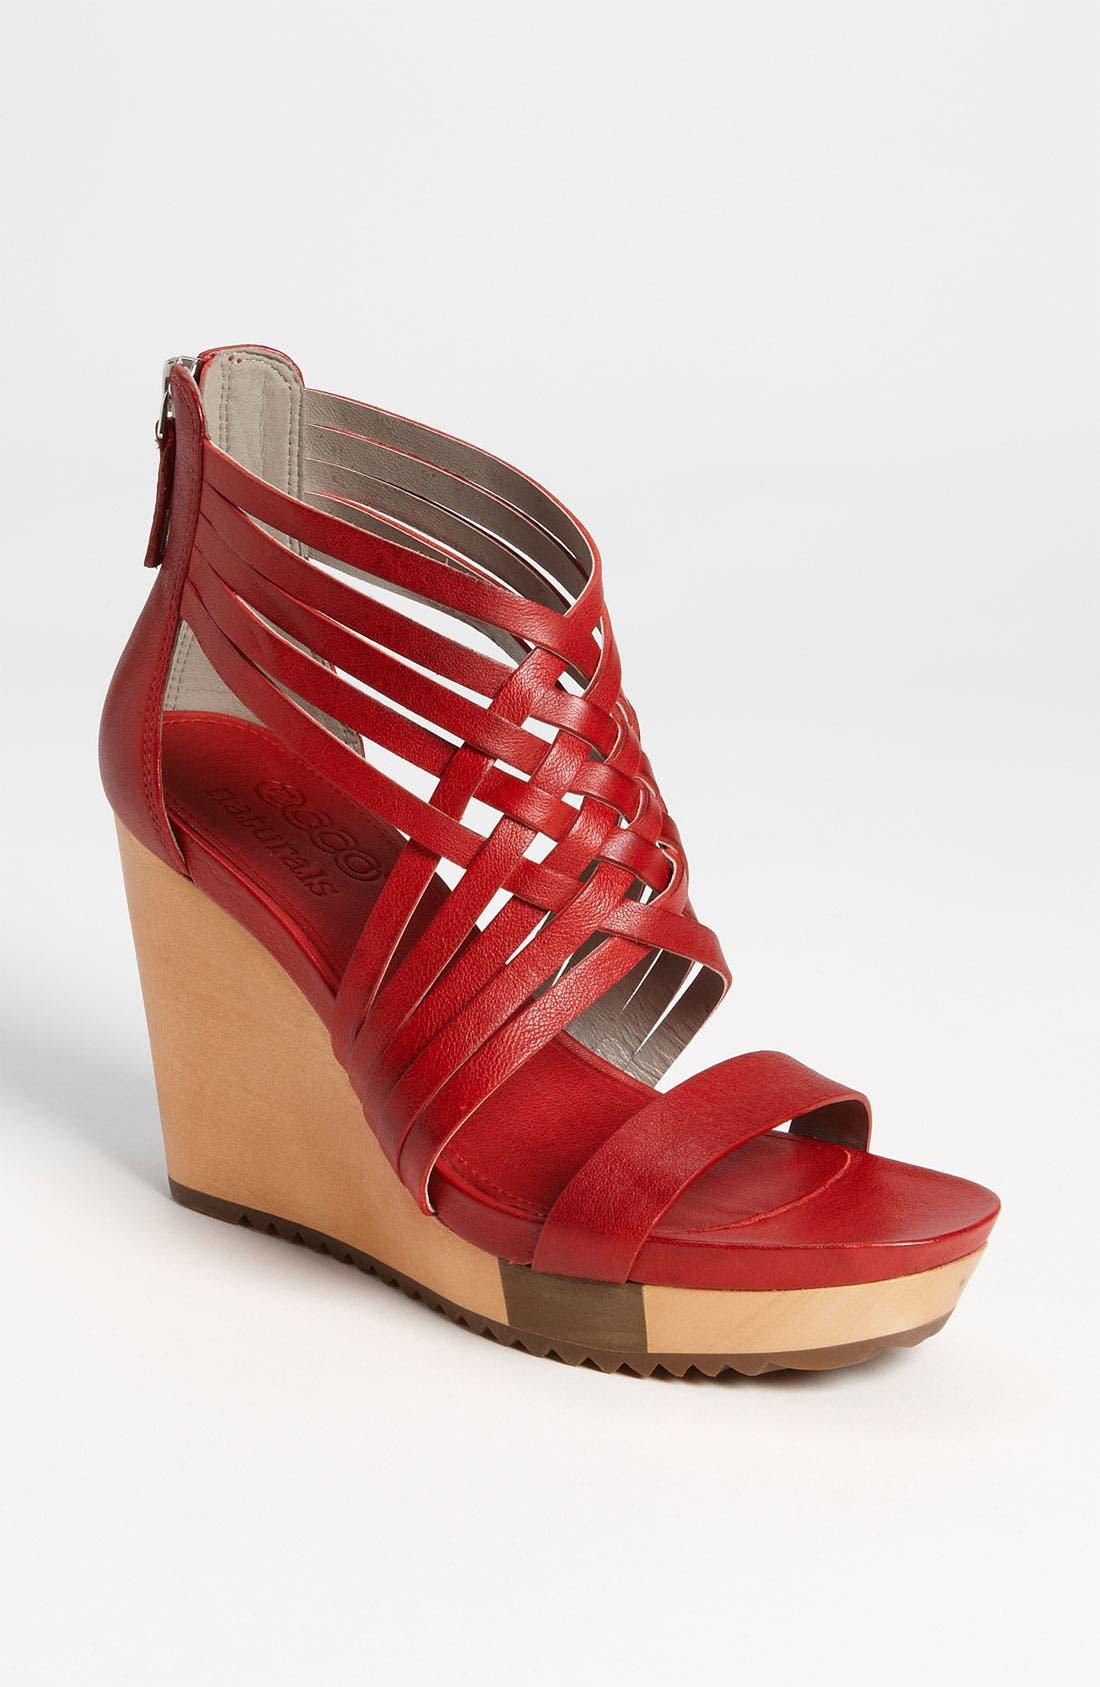 Alternate Image 1 Selected - ECCO 'Moki Woven' Sandal